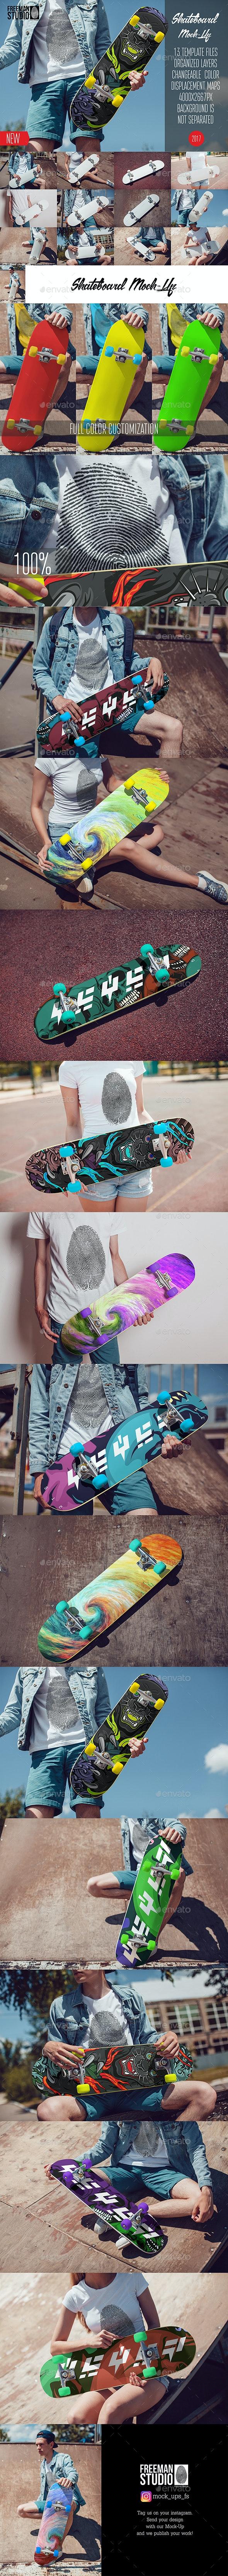 Skateboard Mock-Up Vol.1 2017 - Product Mock-Ups Graphics